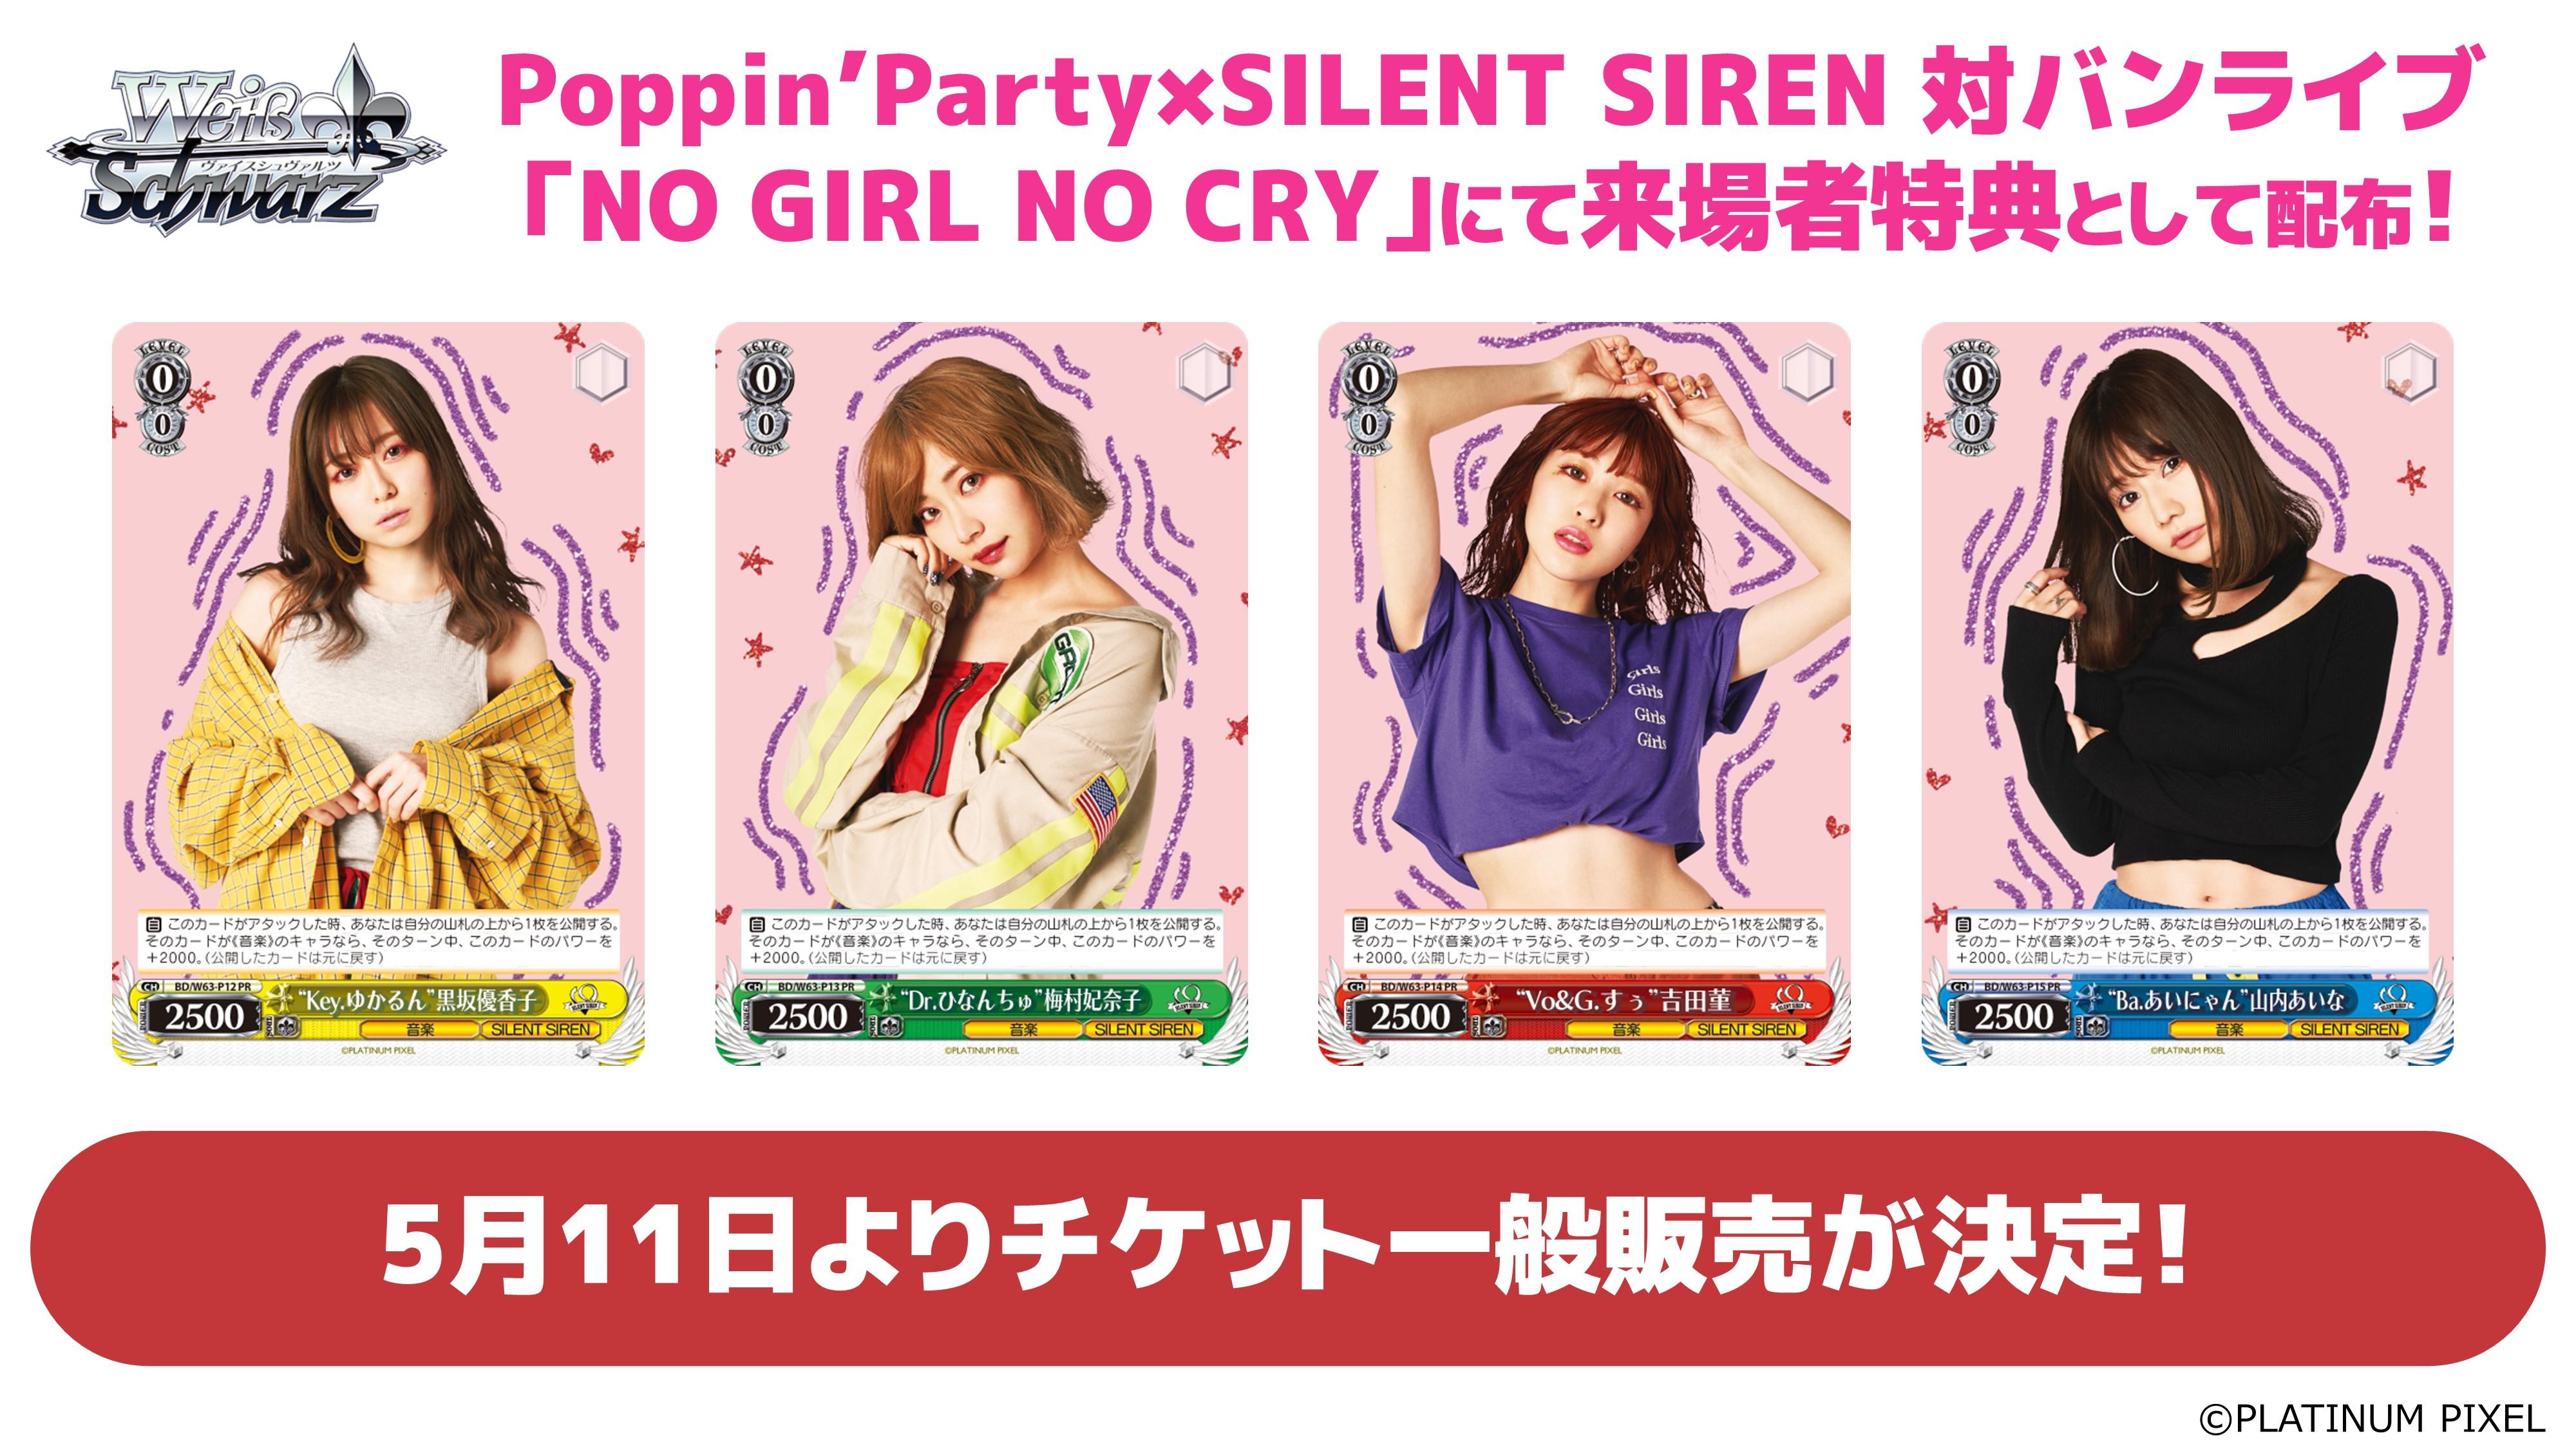 Poppin'Party×SILENT SIREN 対バンライブ「NO GIRL NO CRY」のでヴァイスシュヴァルツPRカードの配布が決定!